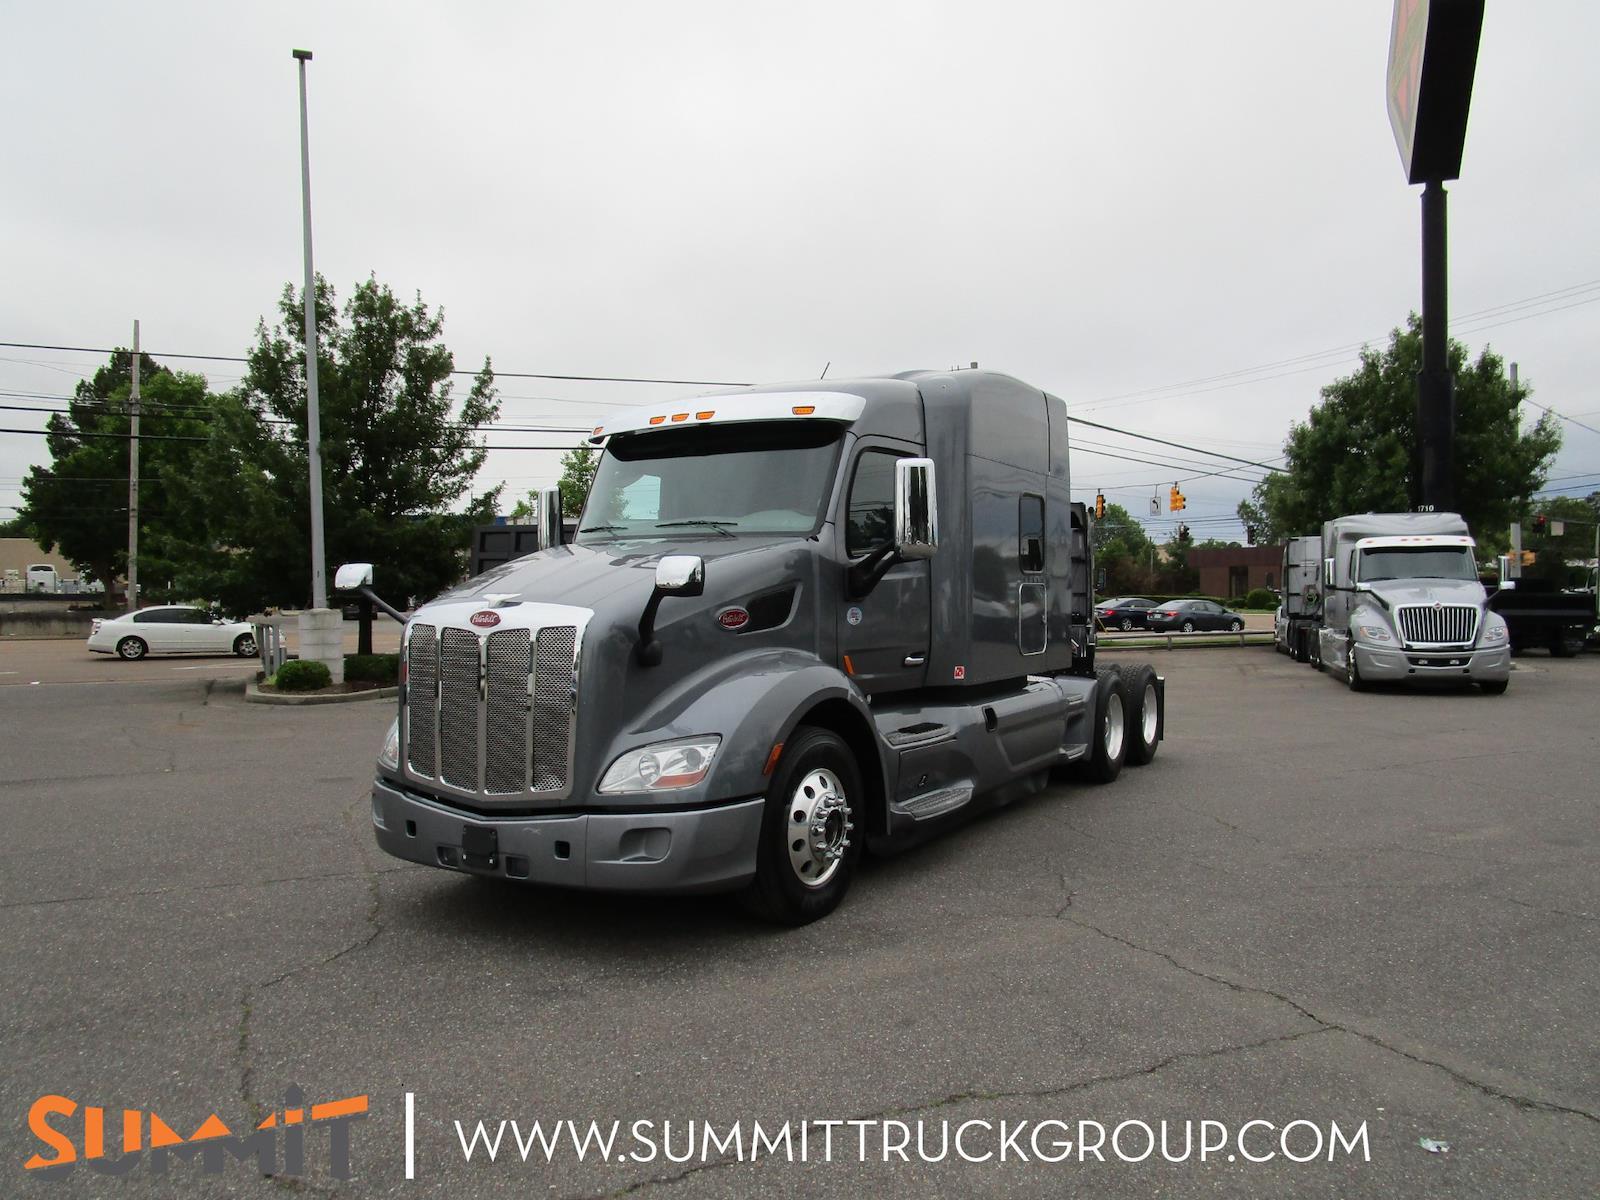 2020 Peterbilt Truck Sleeper Cab 6x4, Tractor #160T211022 - photo 1